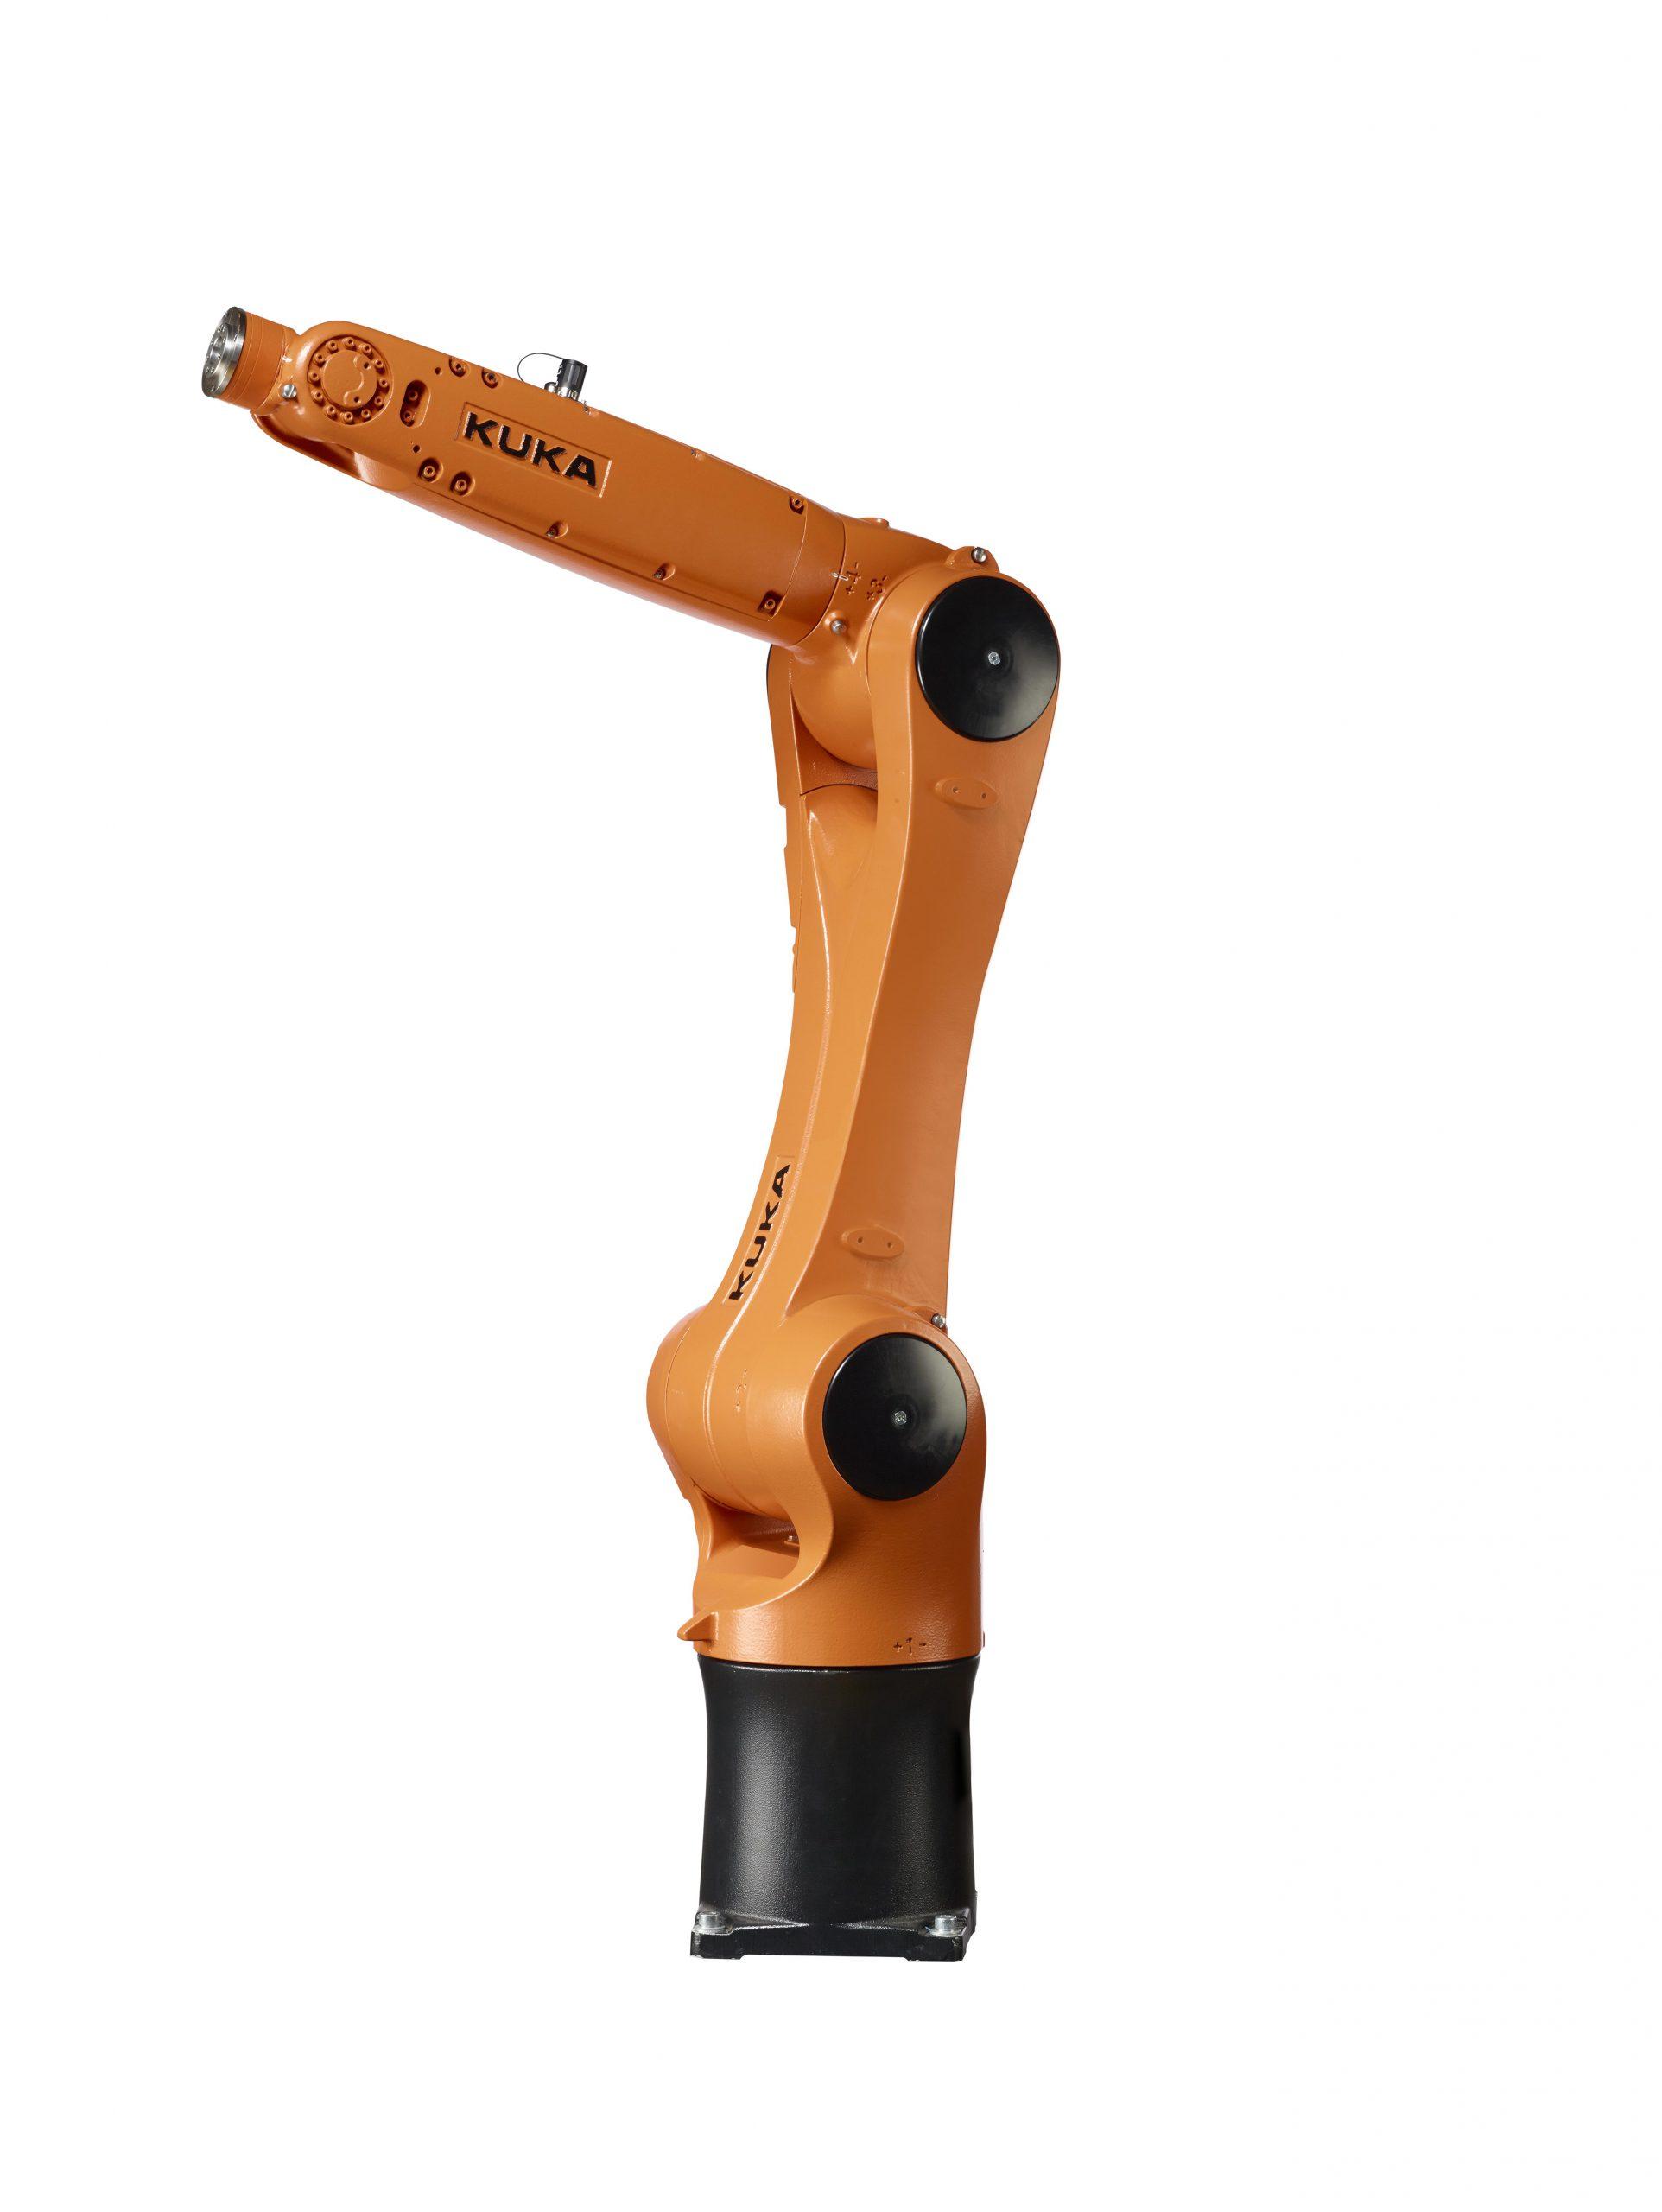 KUKA KR 10 R1100 sixx WP (KR AGILUS)-1